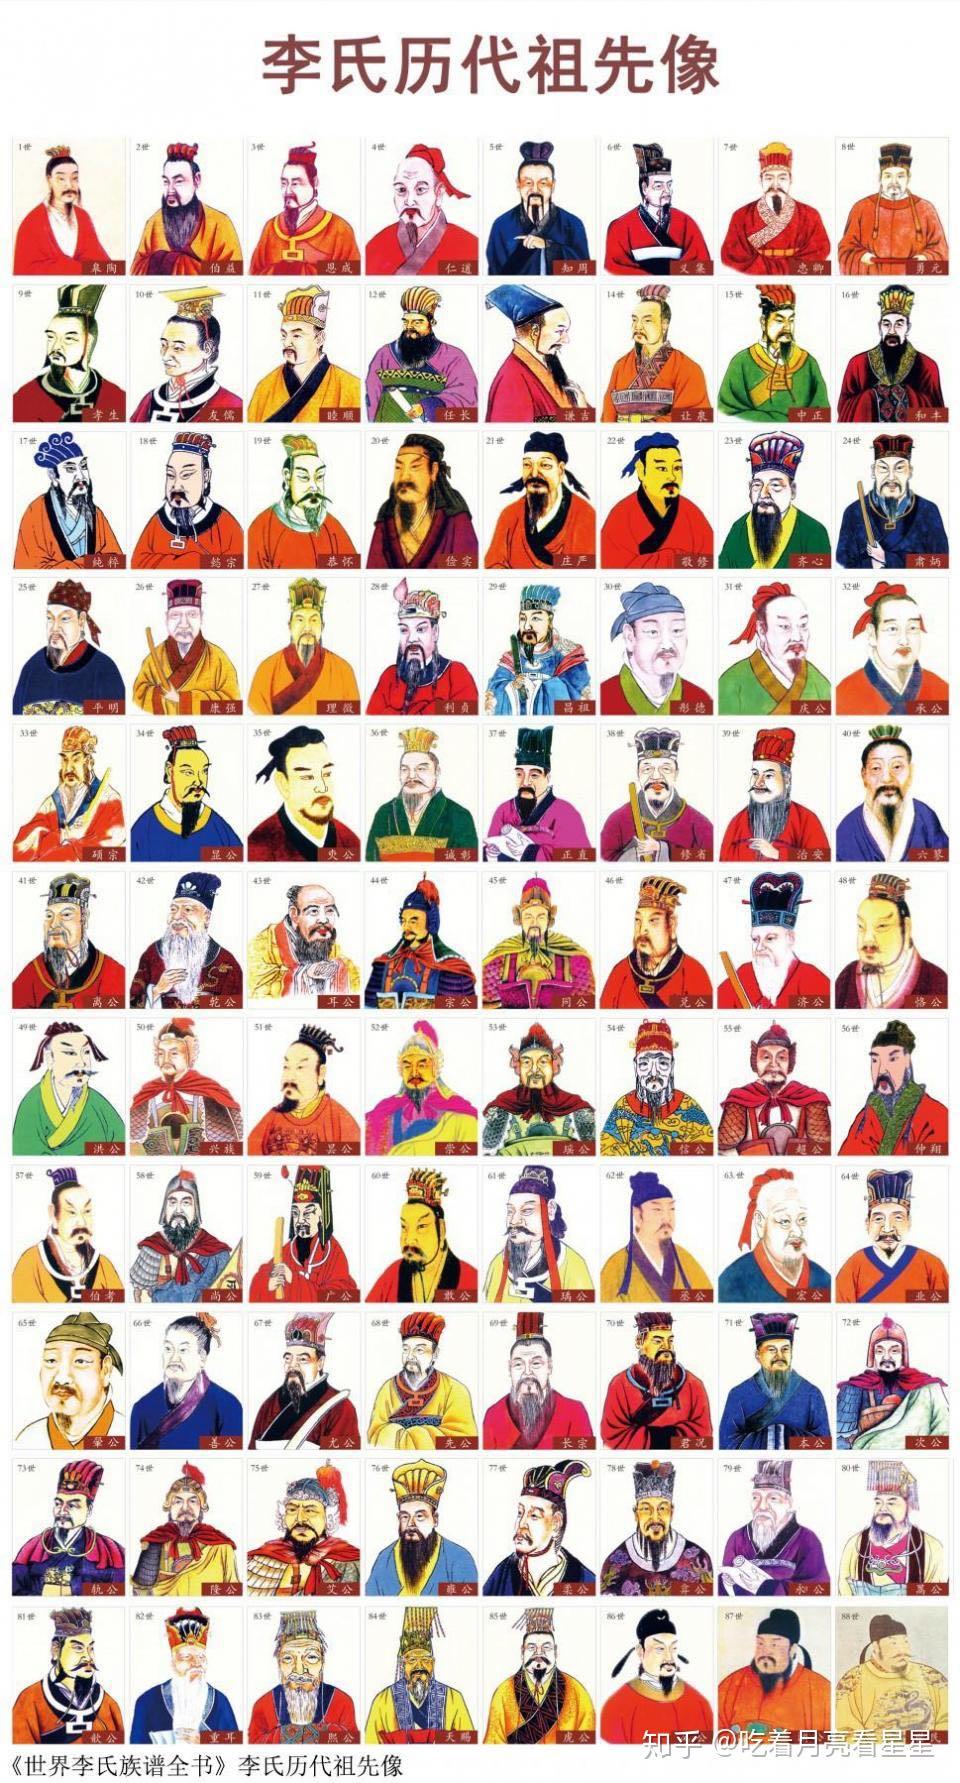 Illustrated portraits of the first 88 generations of Li ancestors